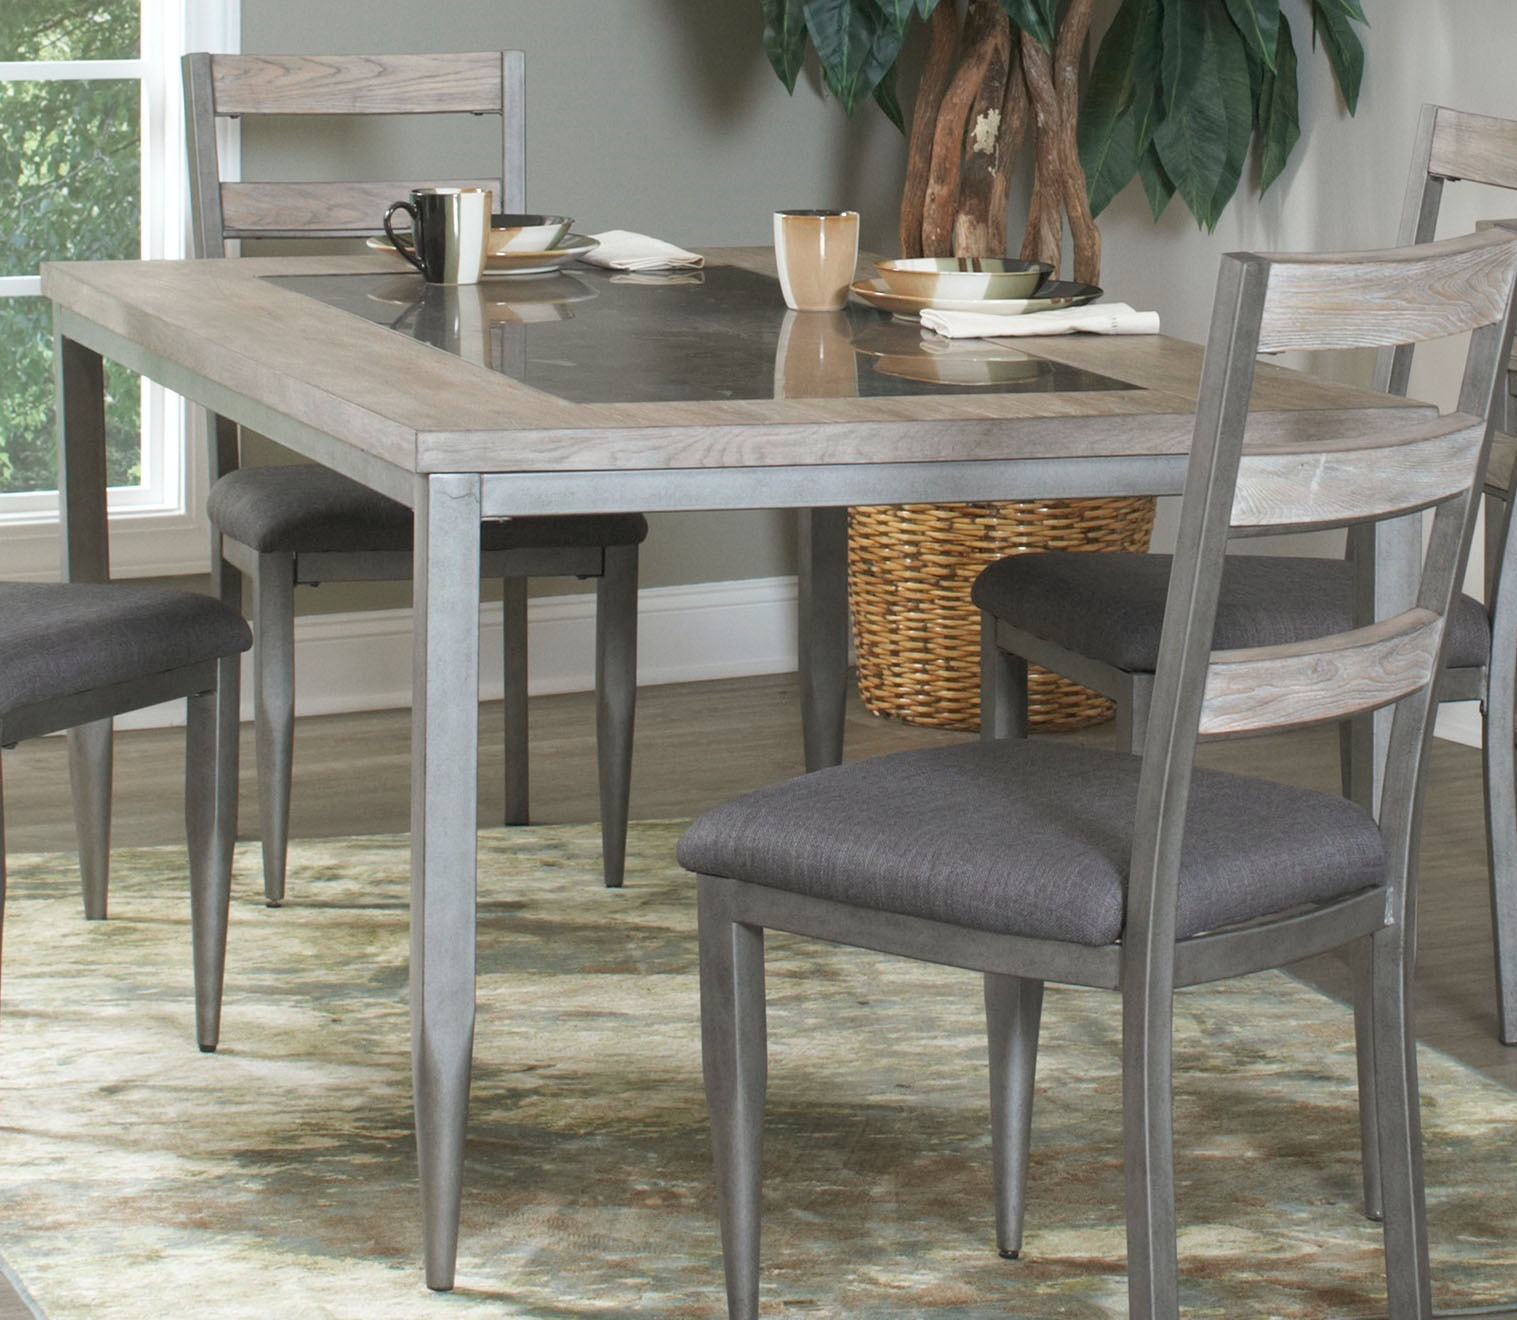 largo international dining room rectangular dining table d312 31 rh matterbrothersfurniture com